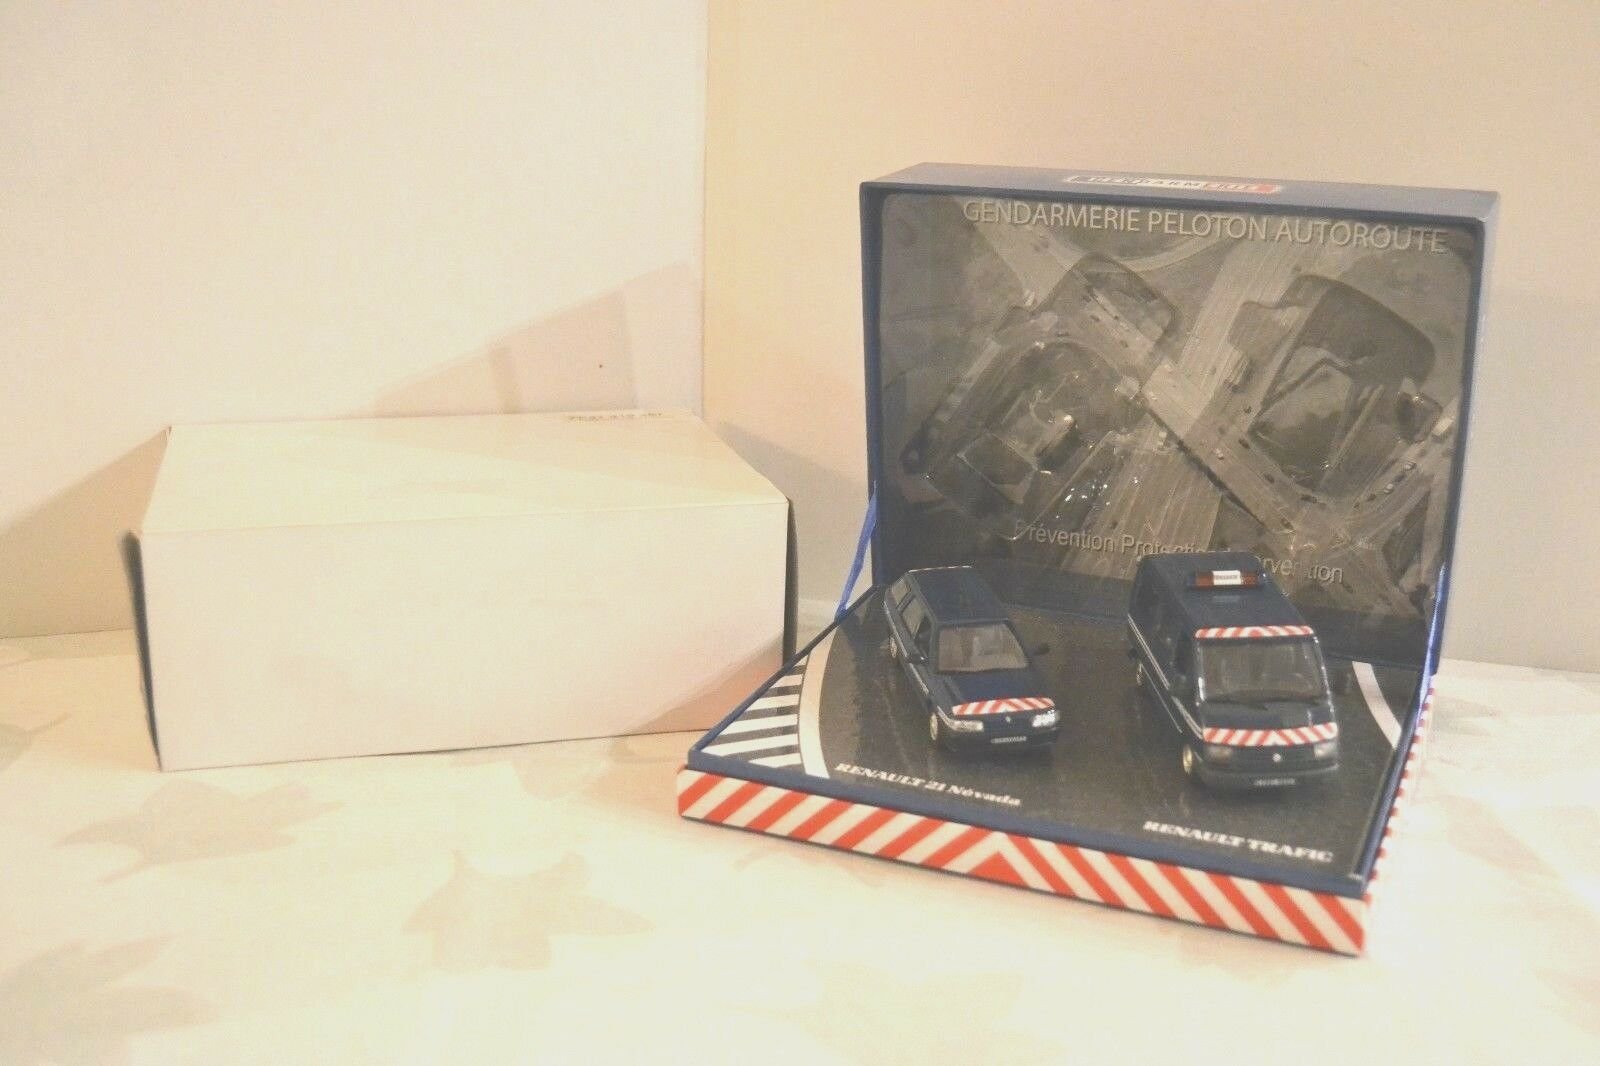 Norev 1 43 Coffret  Gendarmerie Peloton Autorute  1995. Réf. 77 11 419 287.